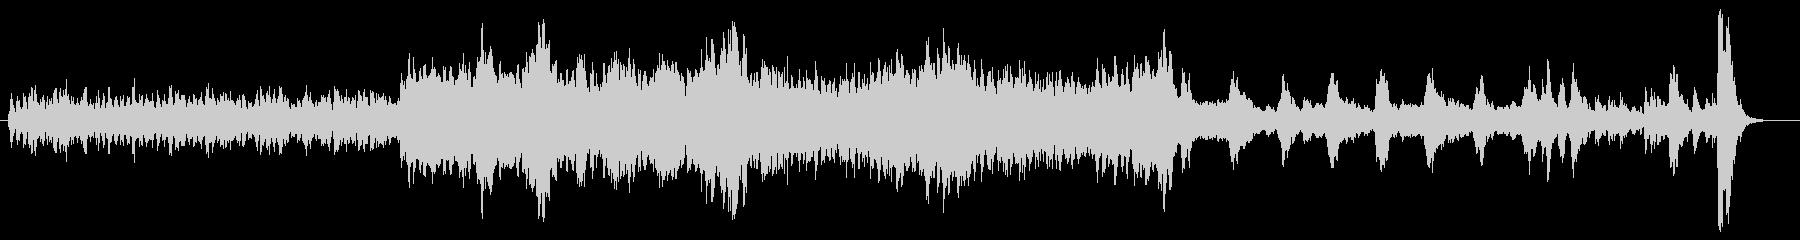 b悲劇的で緊迫したストリングス 1分の未再生の波形